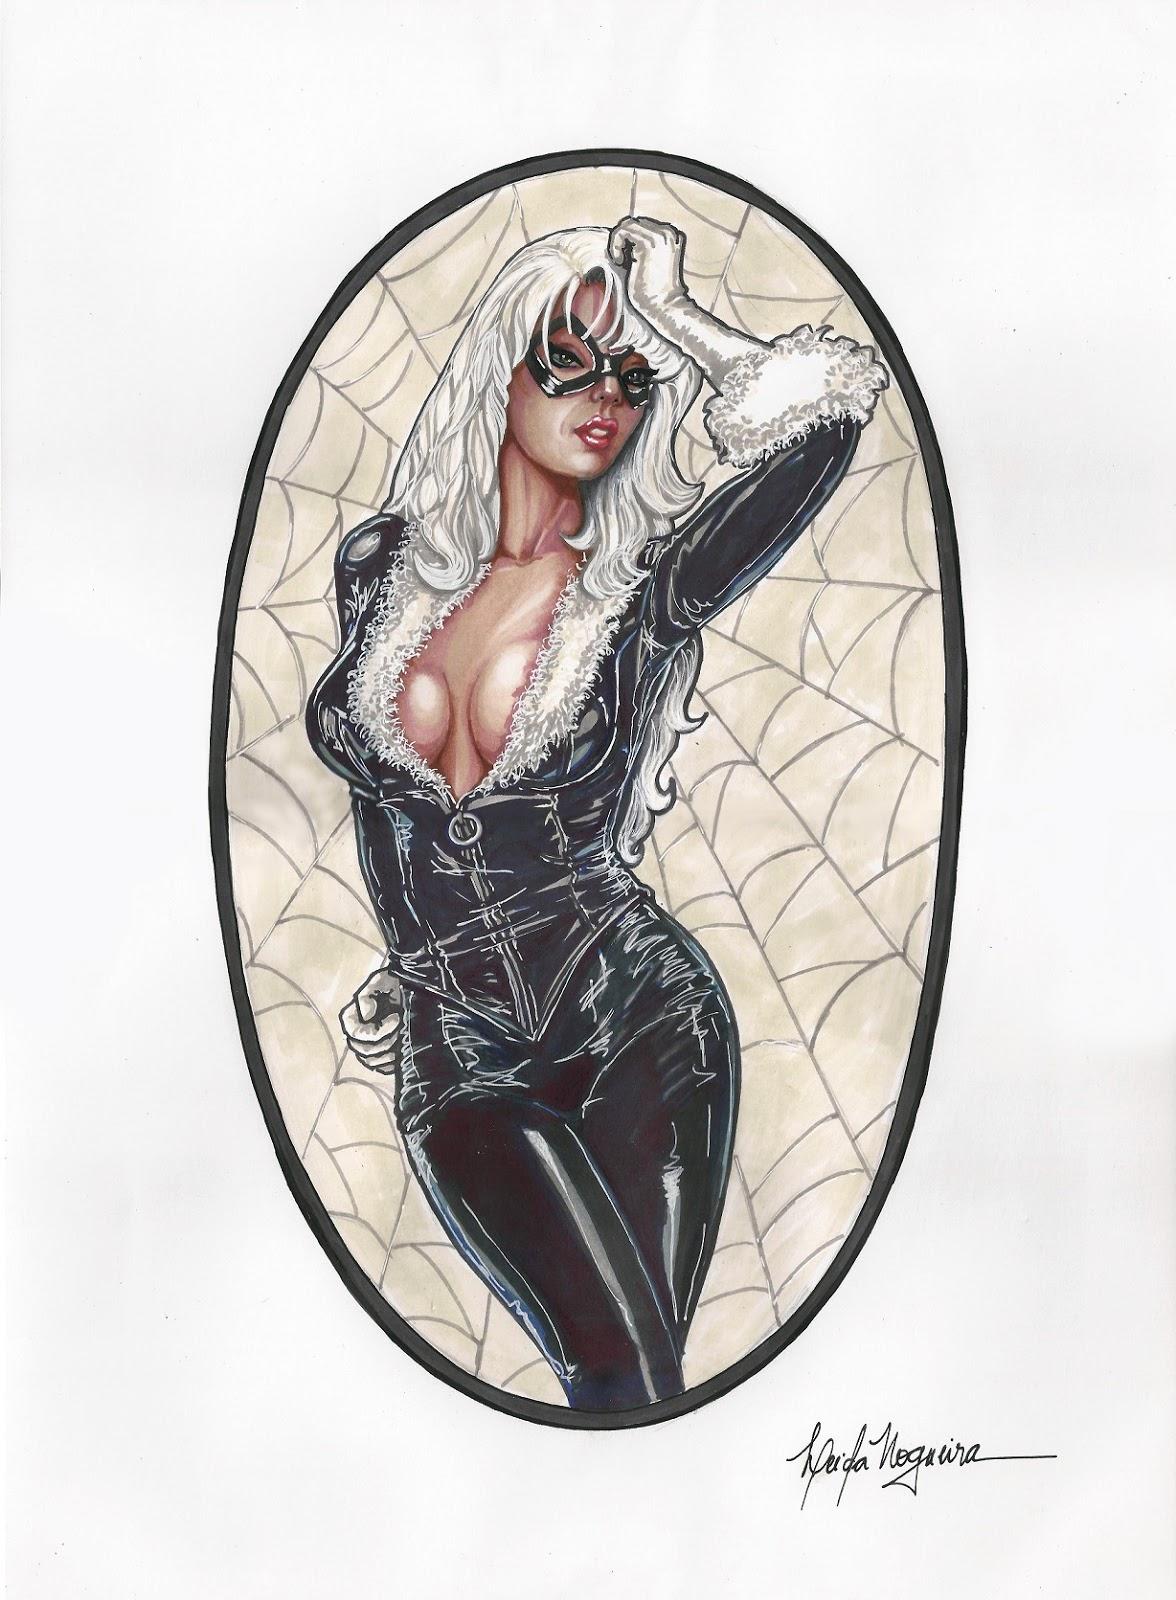 http://3.bp.blogspot.com/-CDTTGQrkOiI/UWimmAUmwOI/AAAAAAAAGzc/fYRz6_x4oNI/s1600/Black+Cat_by_+Leida+Nogueira.jpg